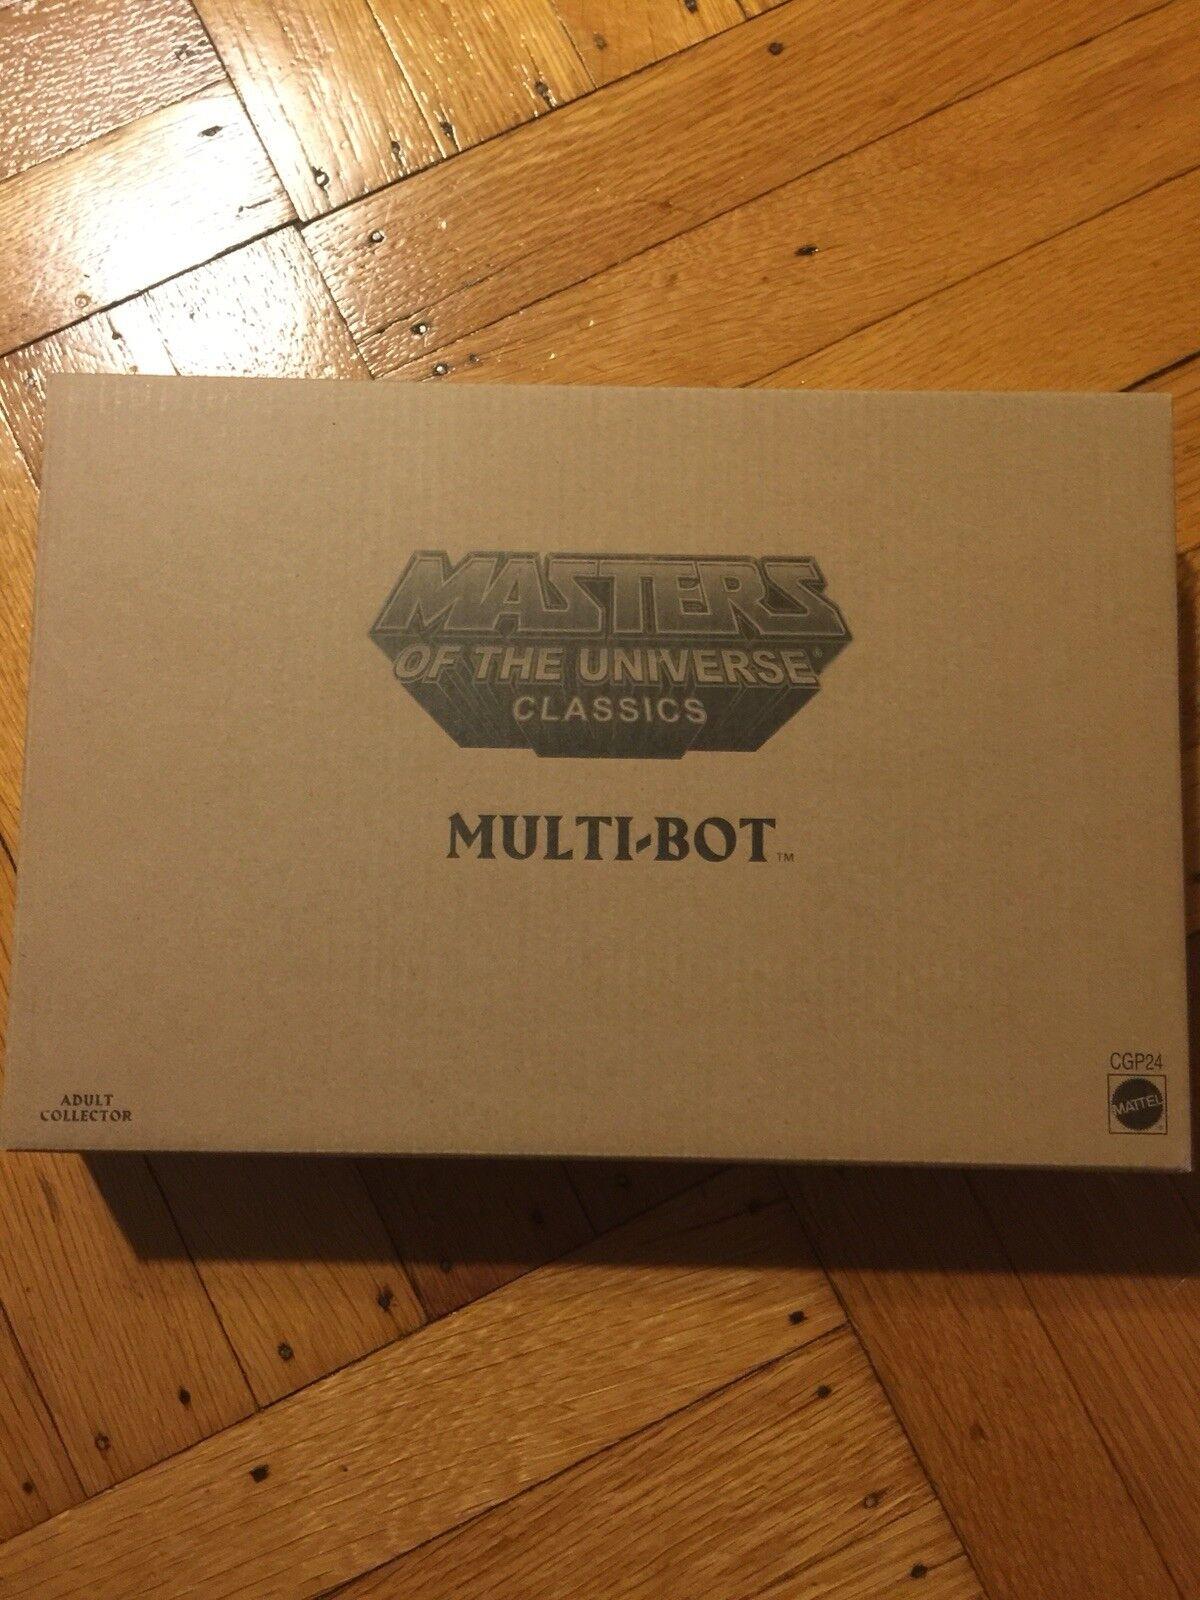 MULTI-BOT MIB Masters of the Universe Classics MOTUC MOTU He-Man multibot